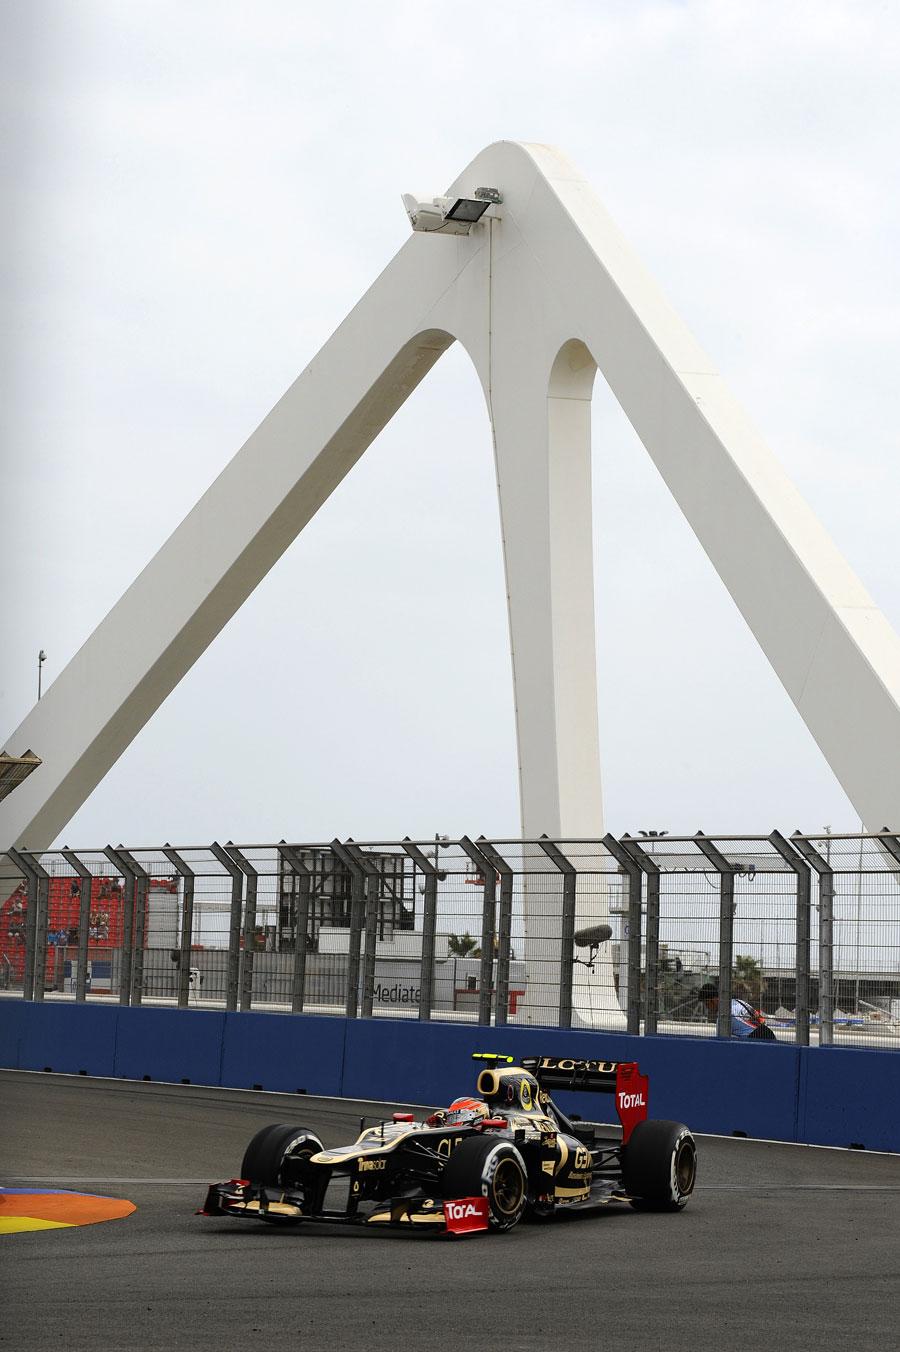 Romain Grosjean aims for the apex of turn 10